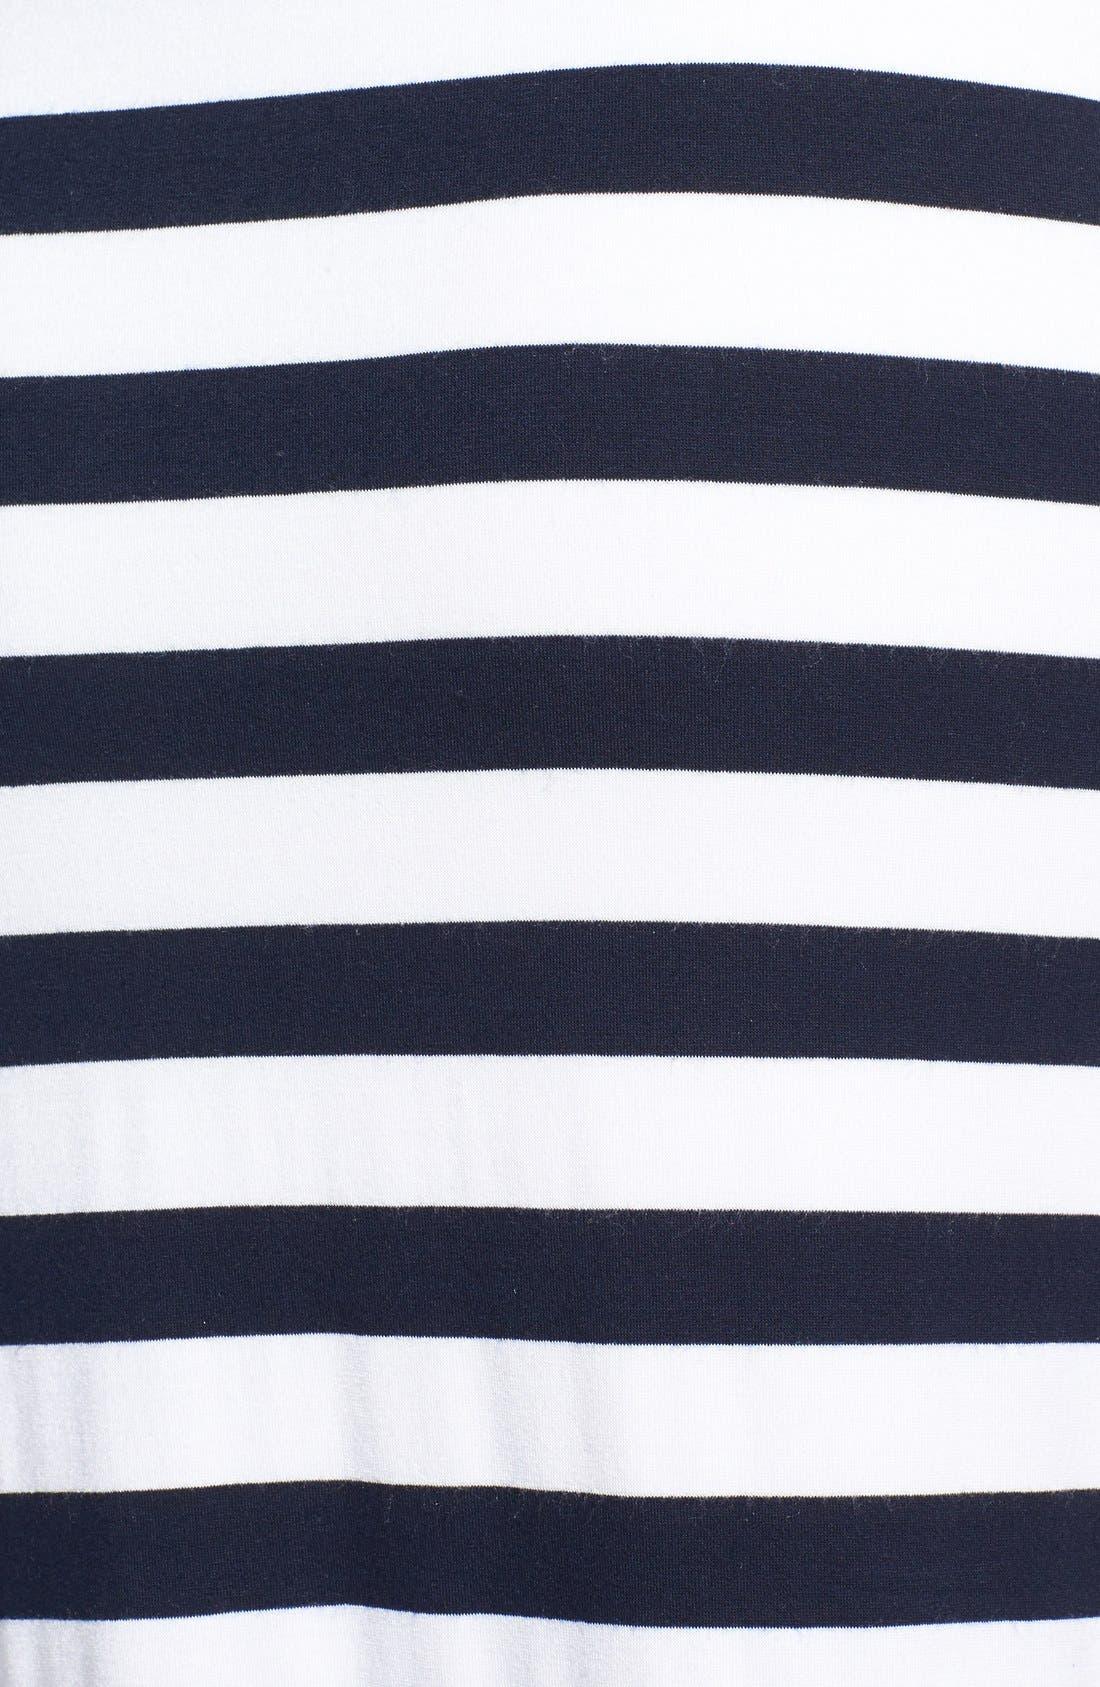 'Tattooed Love Goddess' Stripe Sheer Inset Maxi Dress,                             Alternate thumbnail 2, color,                             001